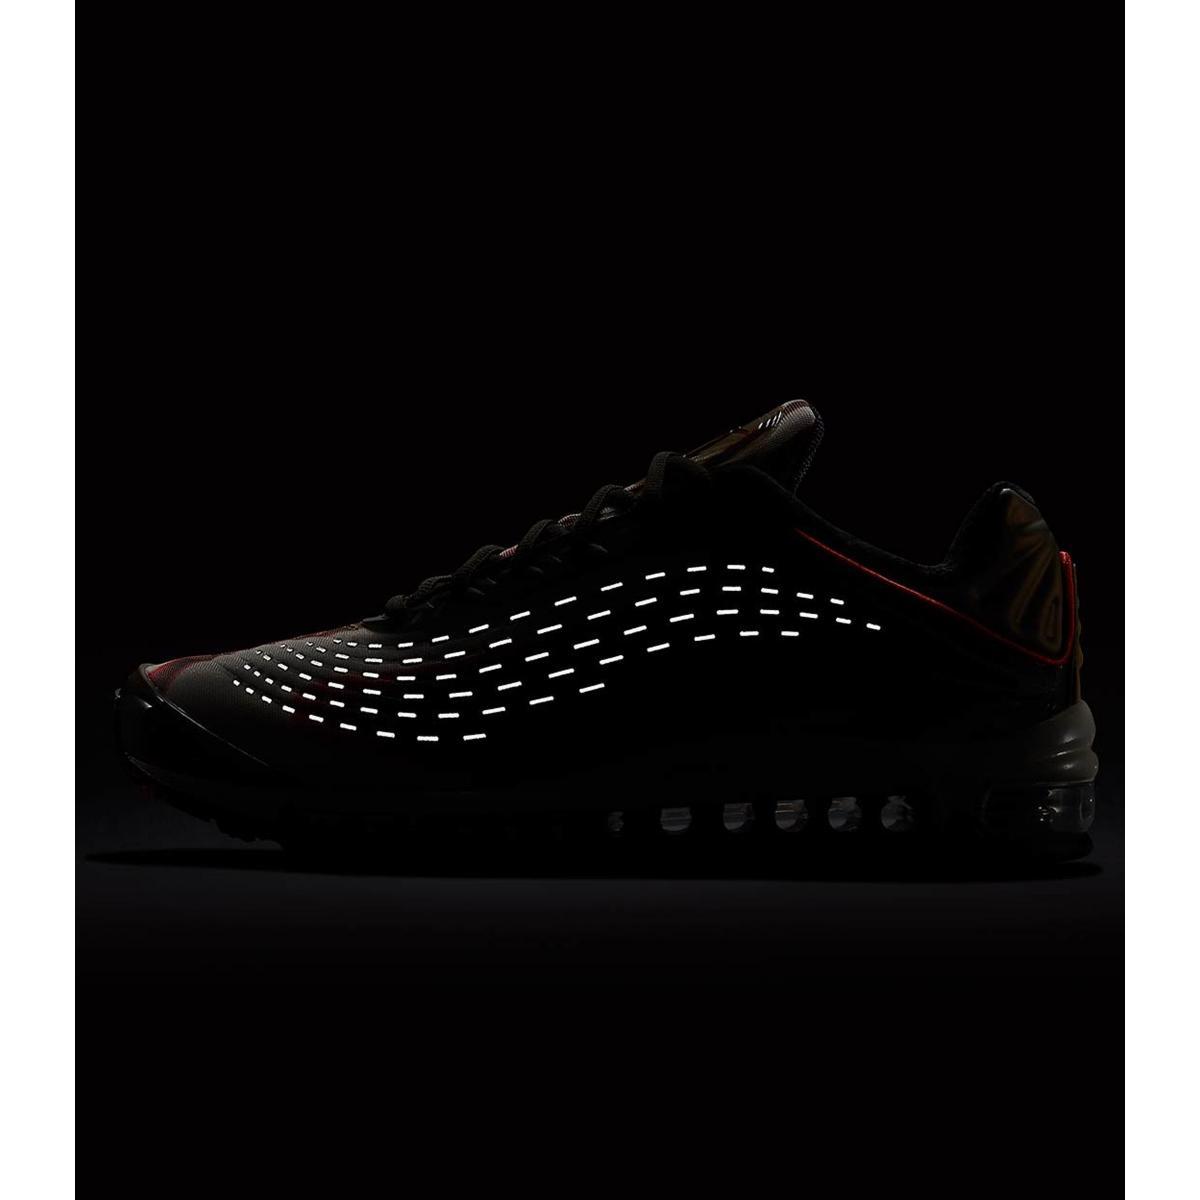 Scarpe Sneakers Nike Air Max Deluxe da uomo rif. AJ7831 300